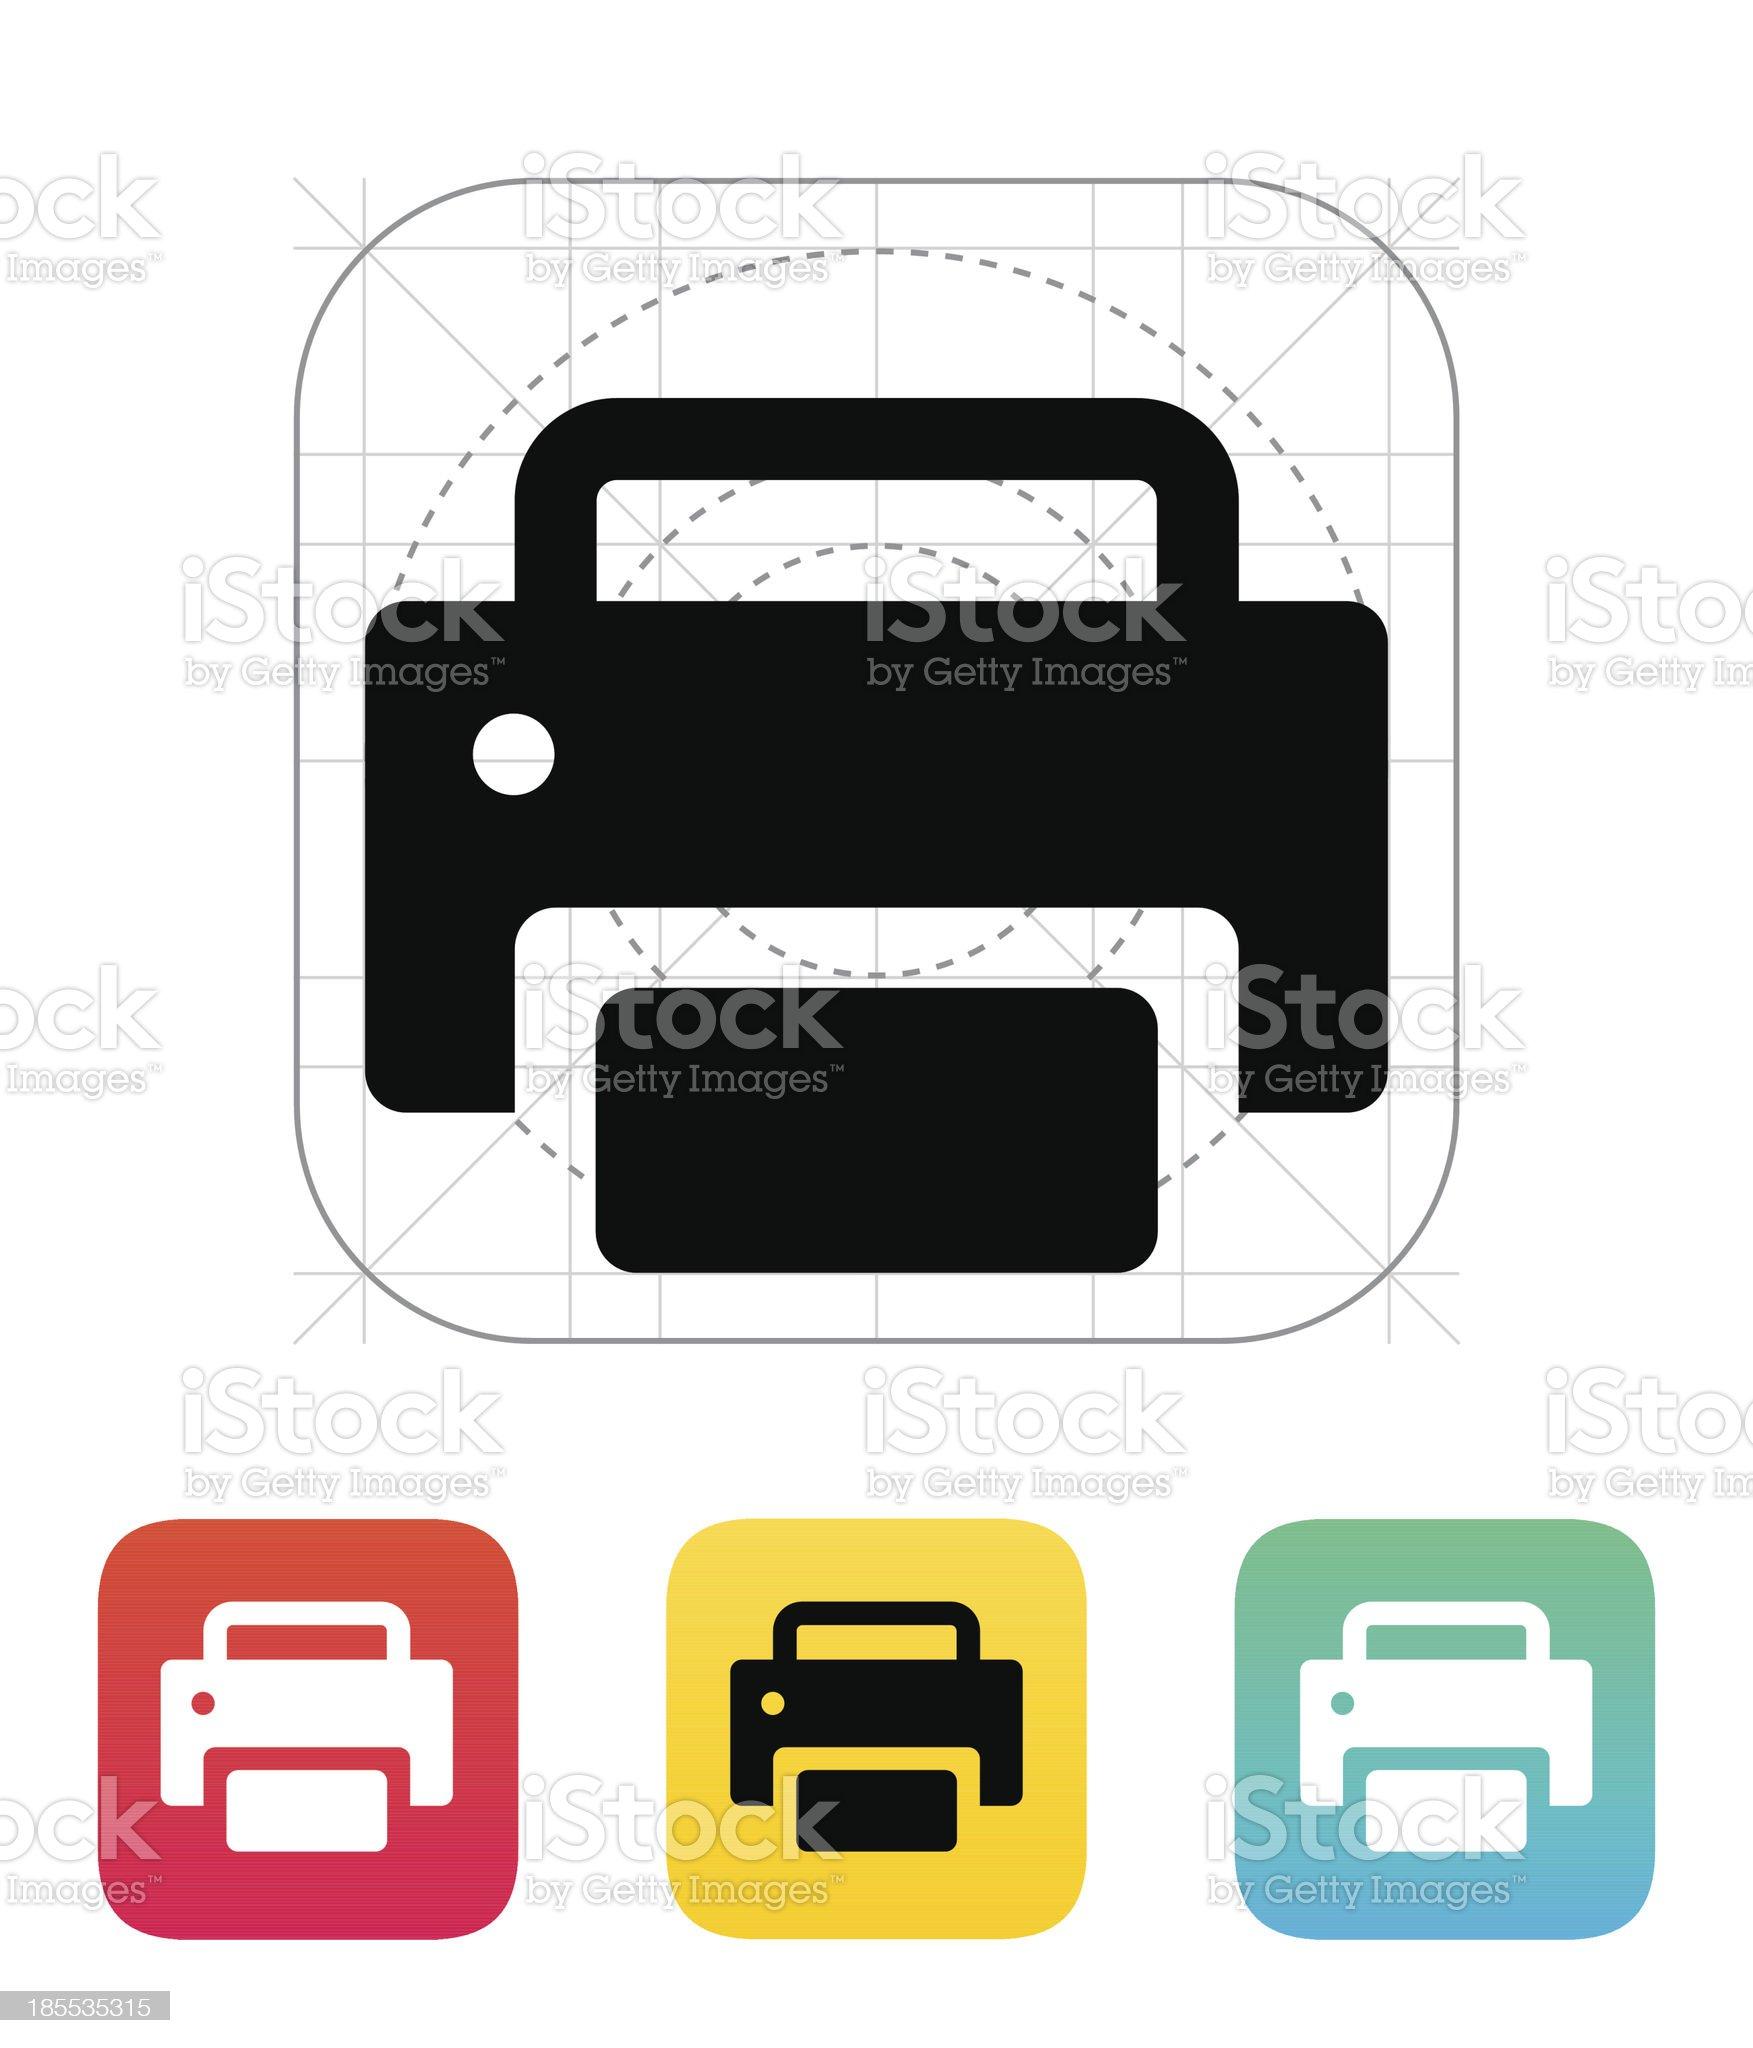 Print icon. royalty-free stock vector art